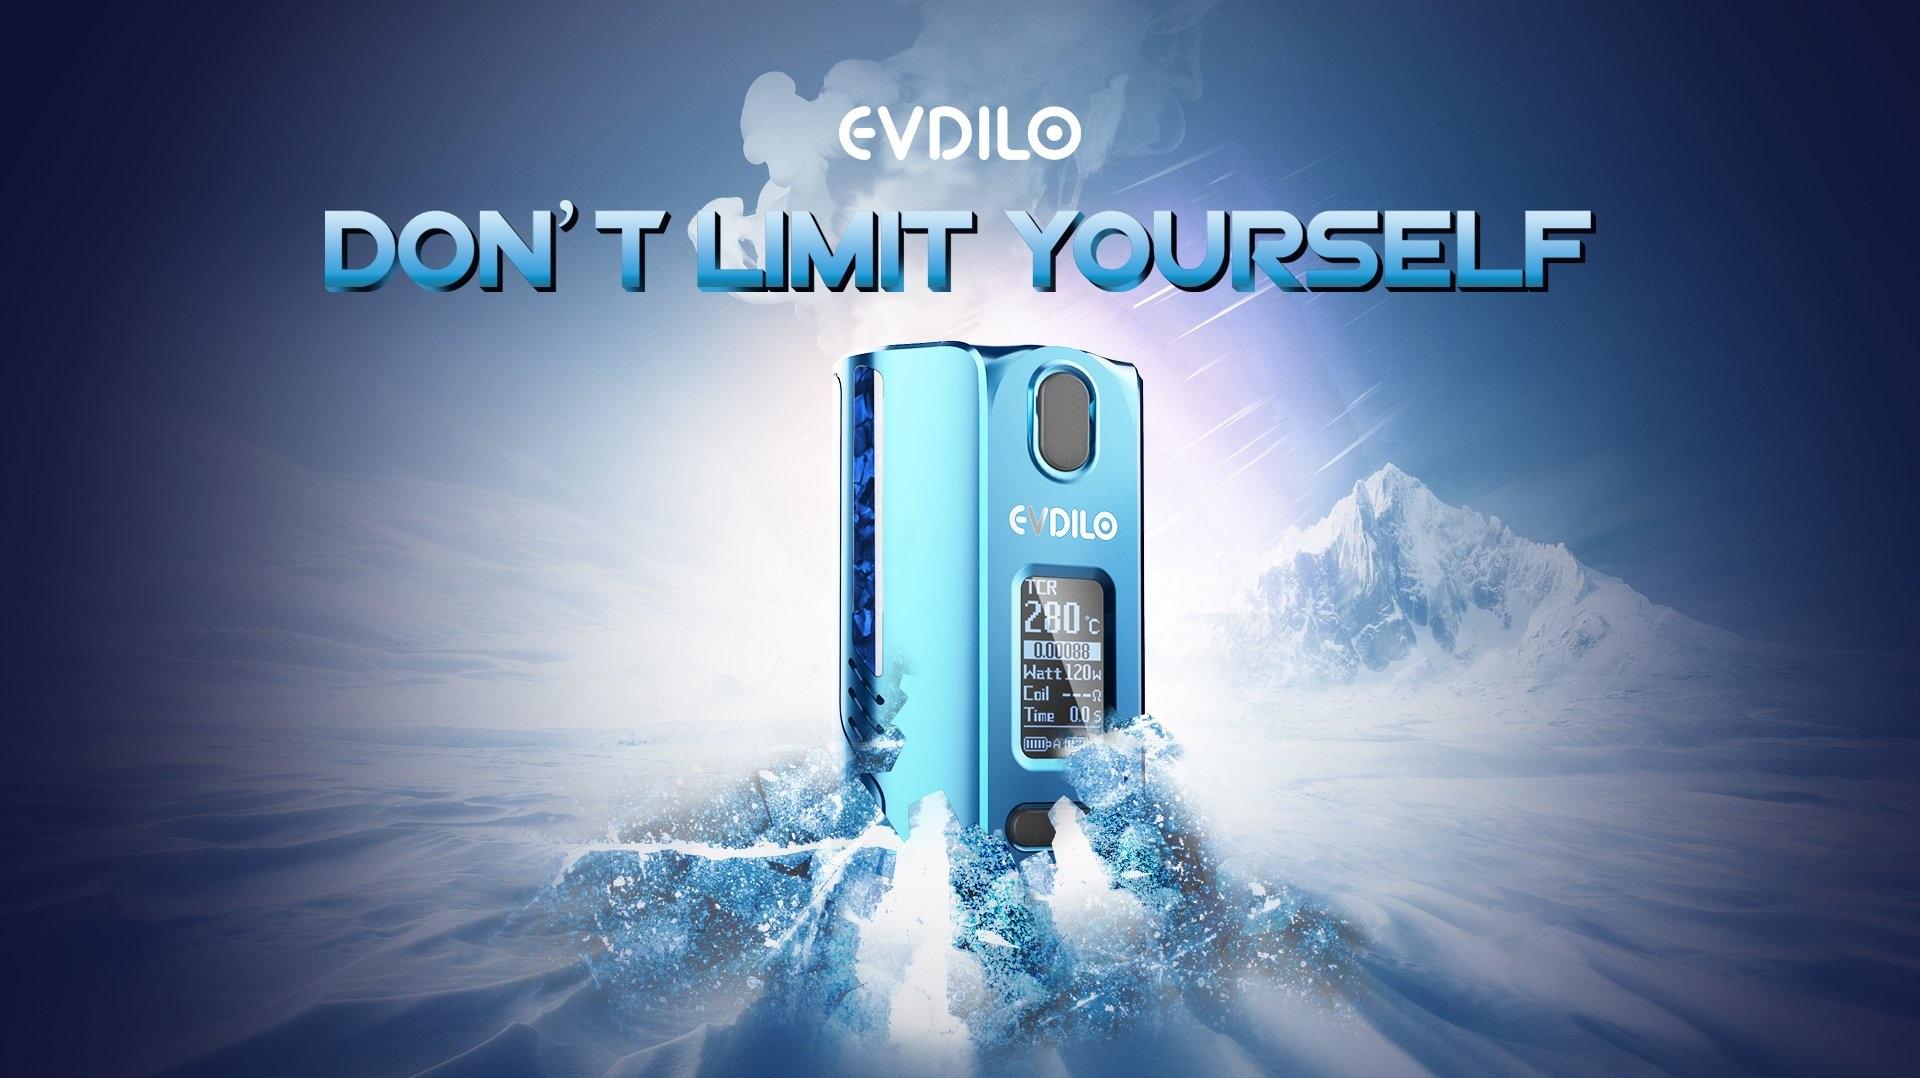 evdilo box mod vape experts 200w by uwell 1